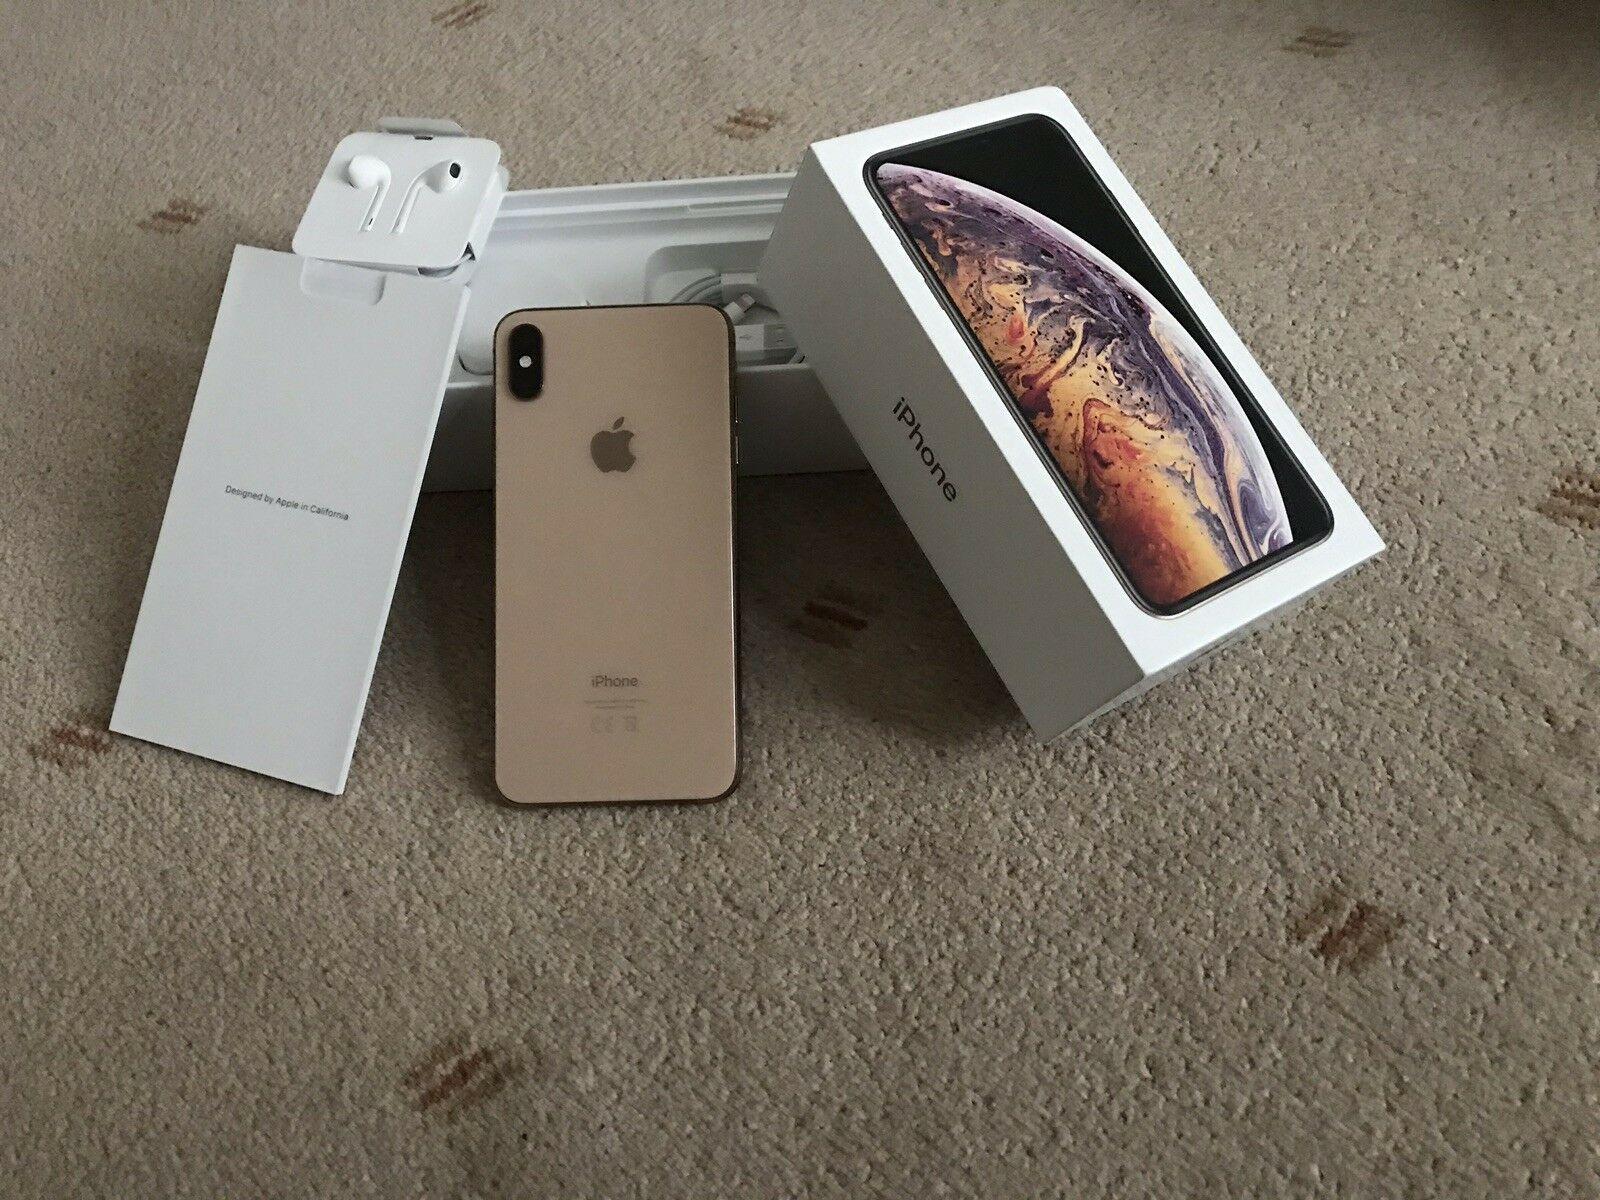 Apple iPhone XS 64GB € 400 iPhone XS Max 64gb € 430 iPhone X 64gb € 300 iPhone XR 64gb € 340 +27661104268